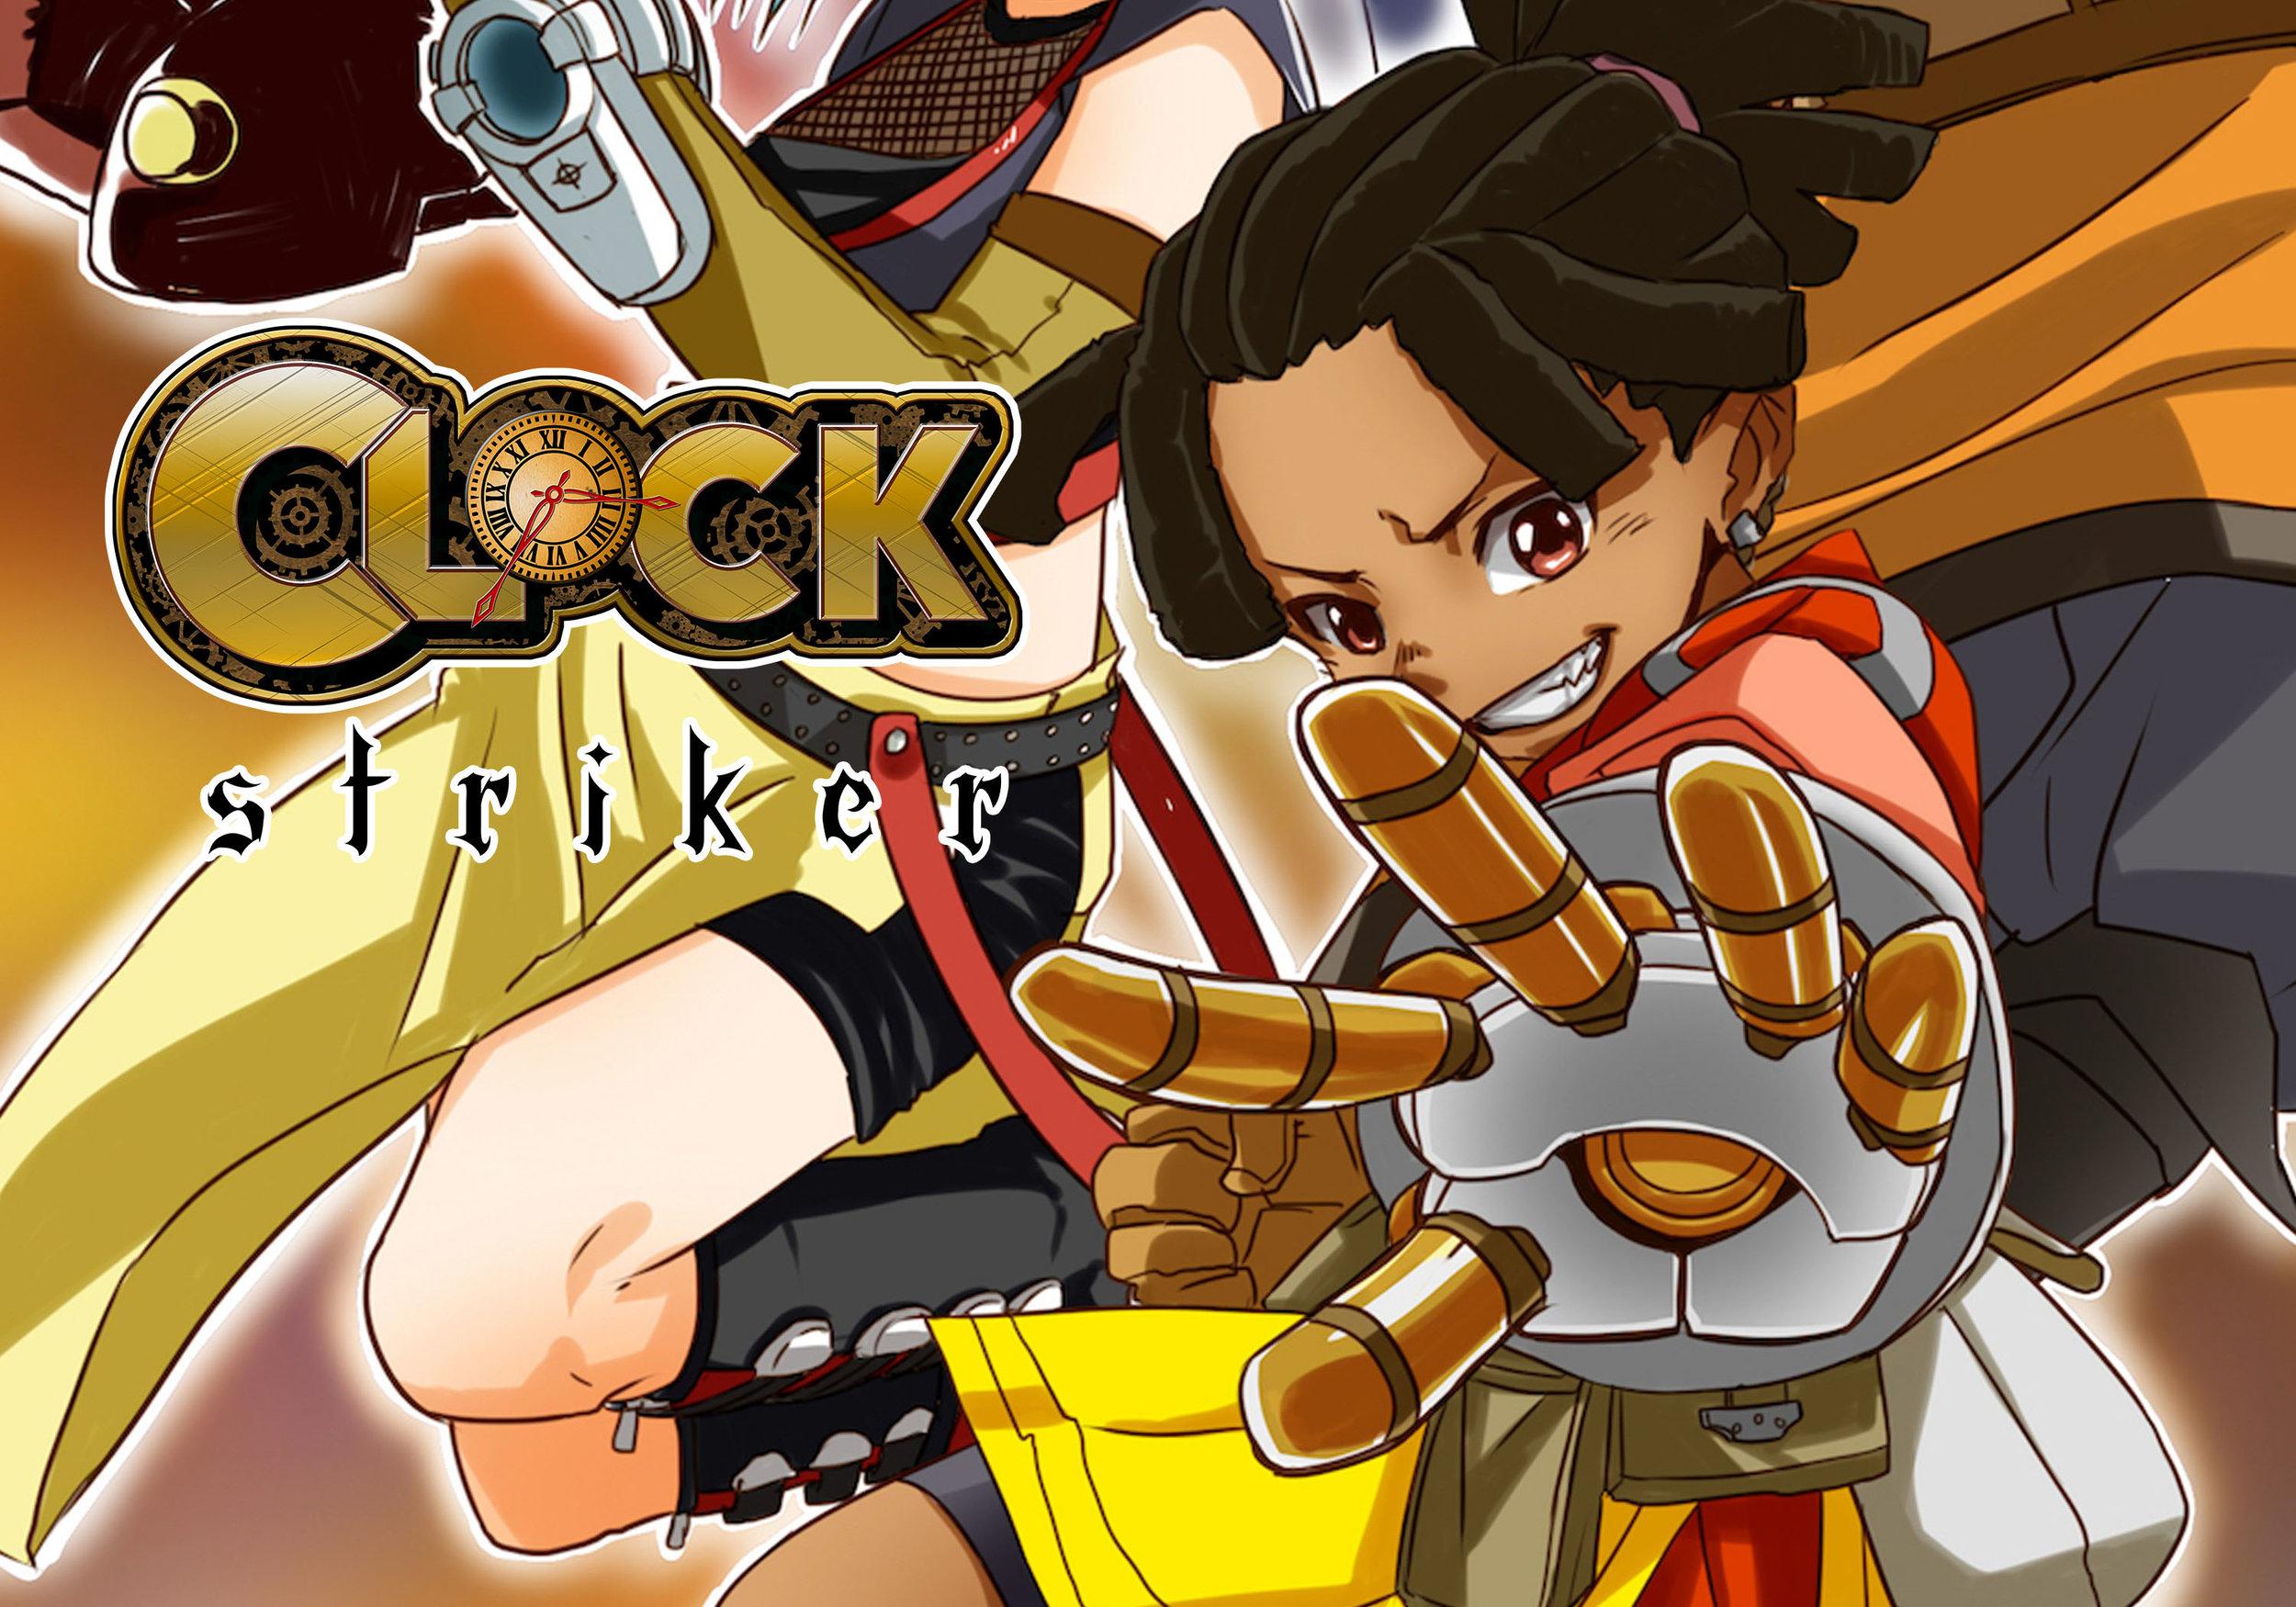 CLOCK STRIKER